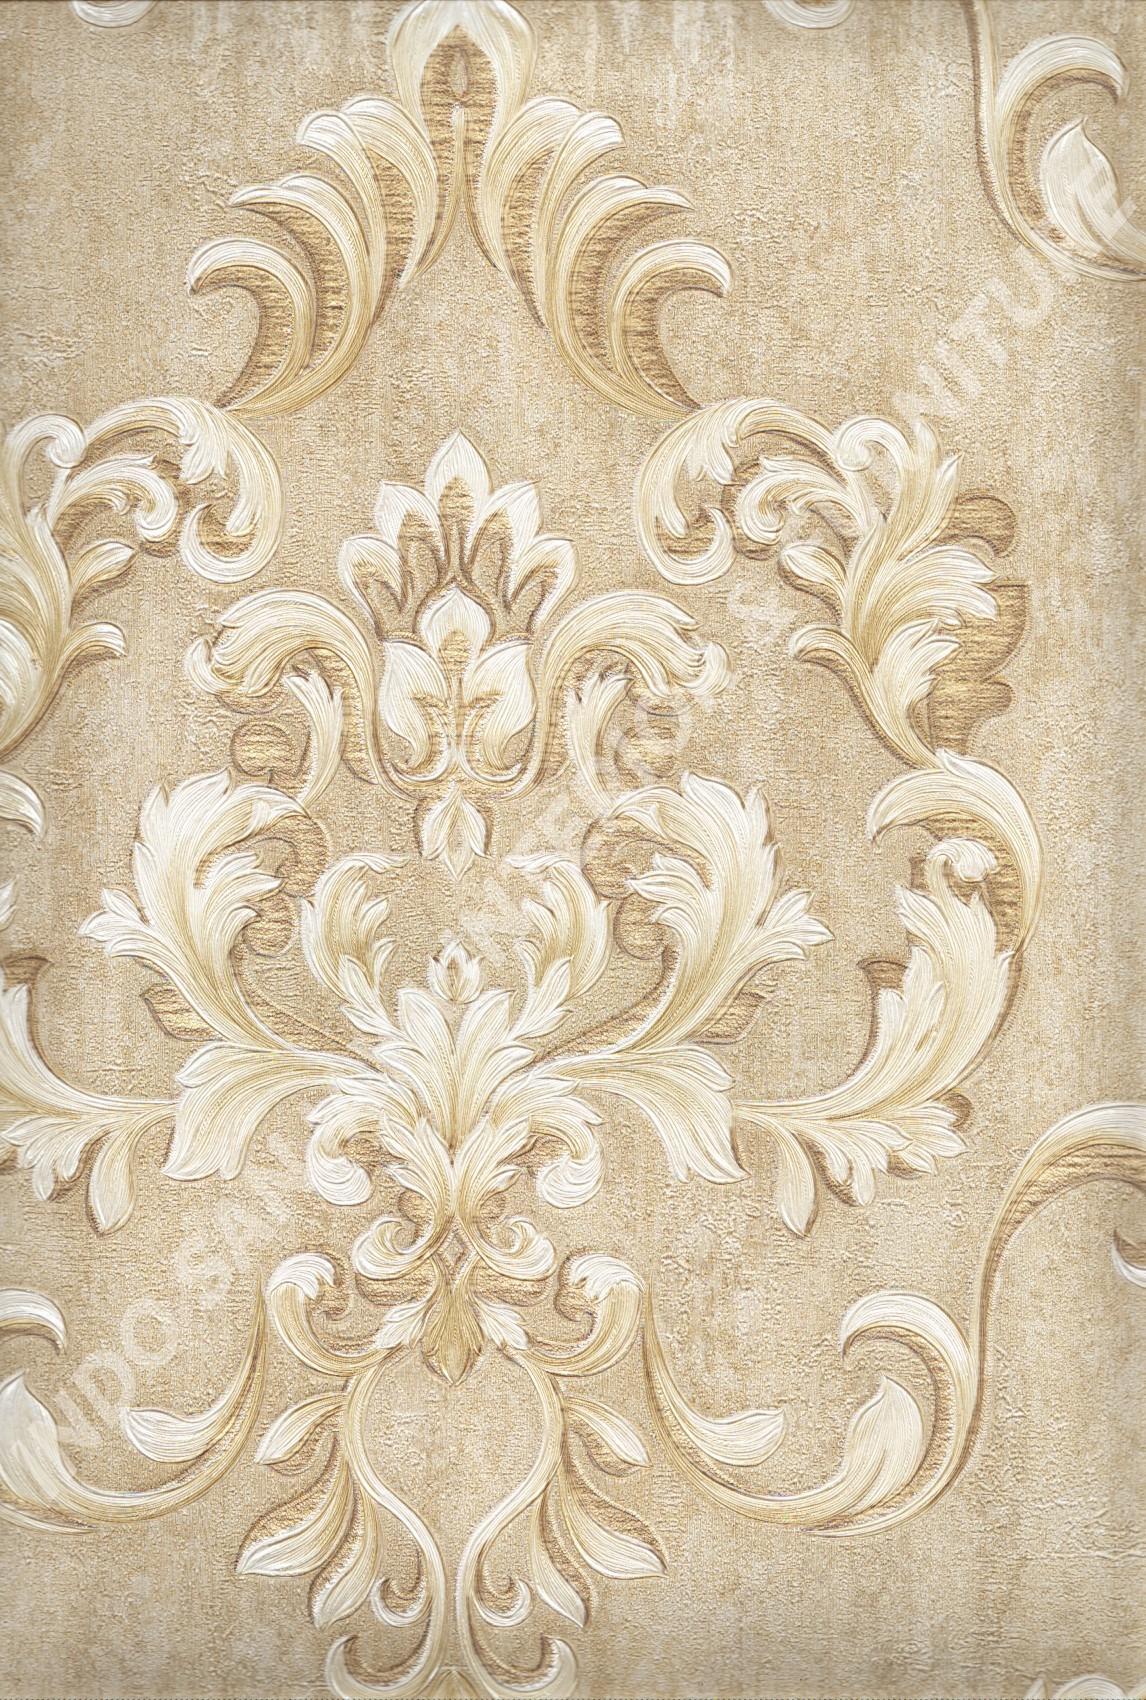 wallpaper   Wallpaper Klasik Batik (Damask) YG80502:YG80502 corak  warna